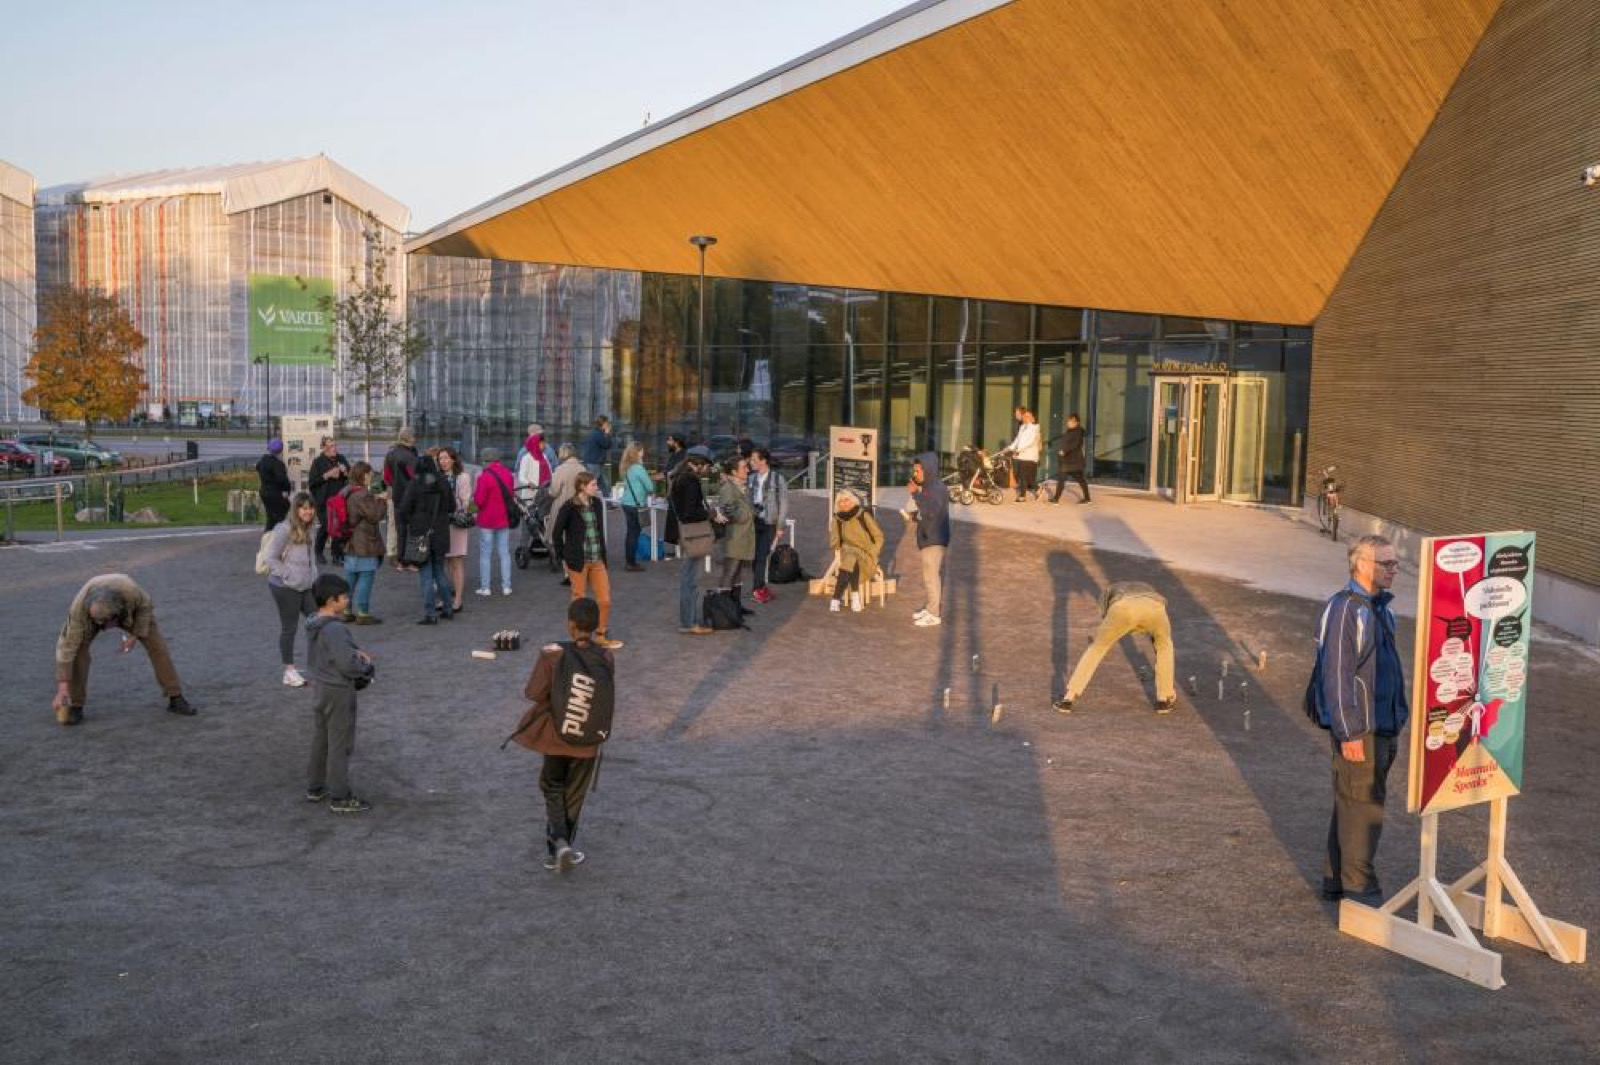 Partizaning Maunula, installation view, photo: Vesa Pekka Gronfors